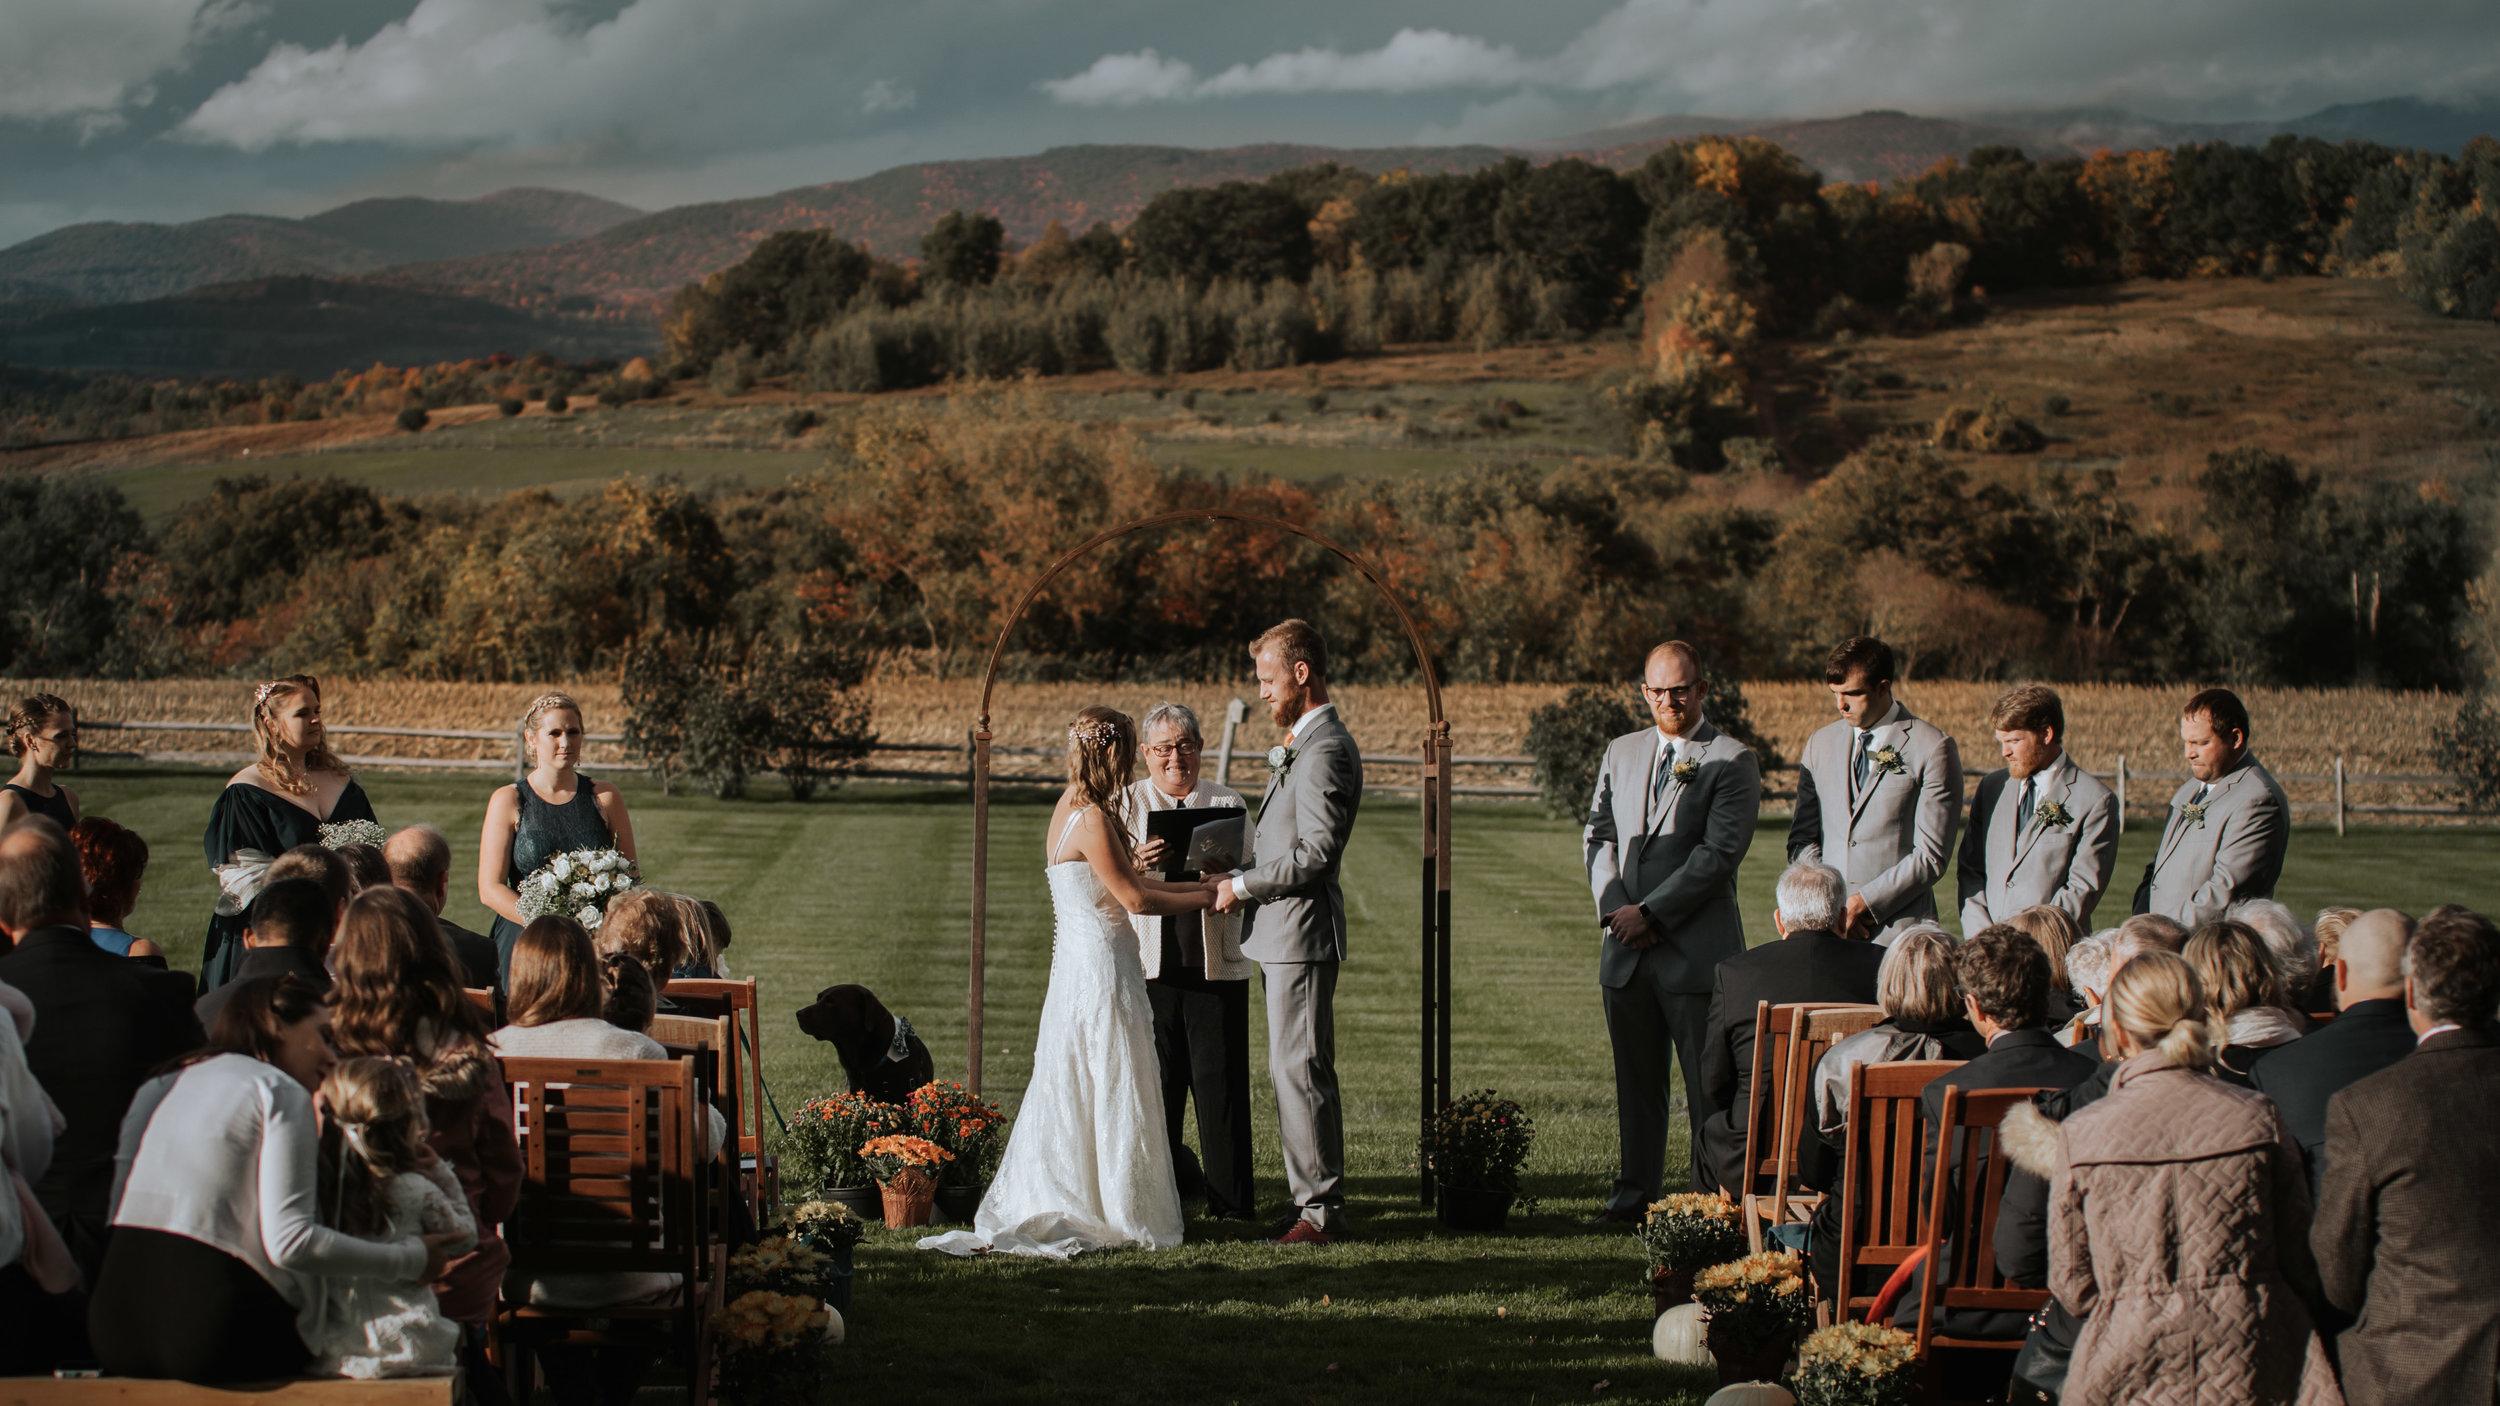 Vermont Wedding | Lorianna Weathers Photography-0629.jpg